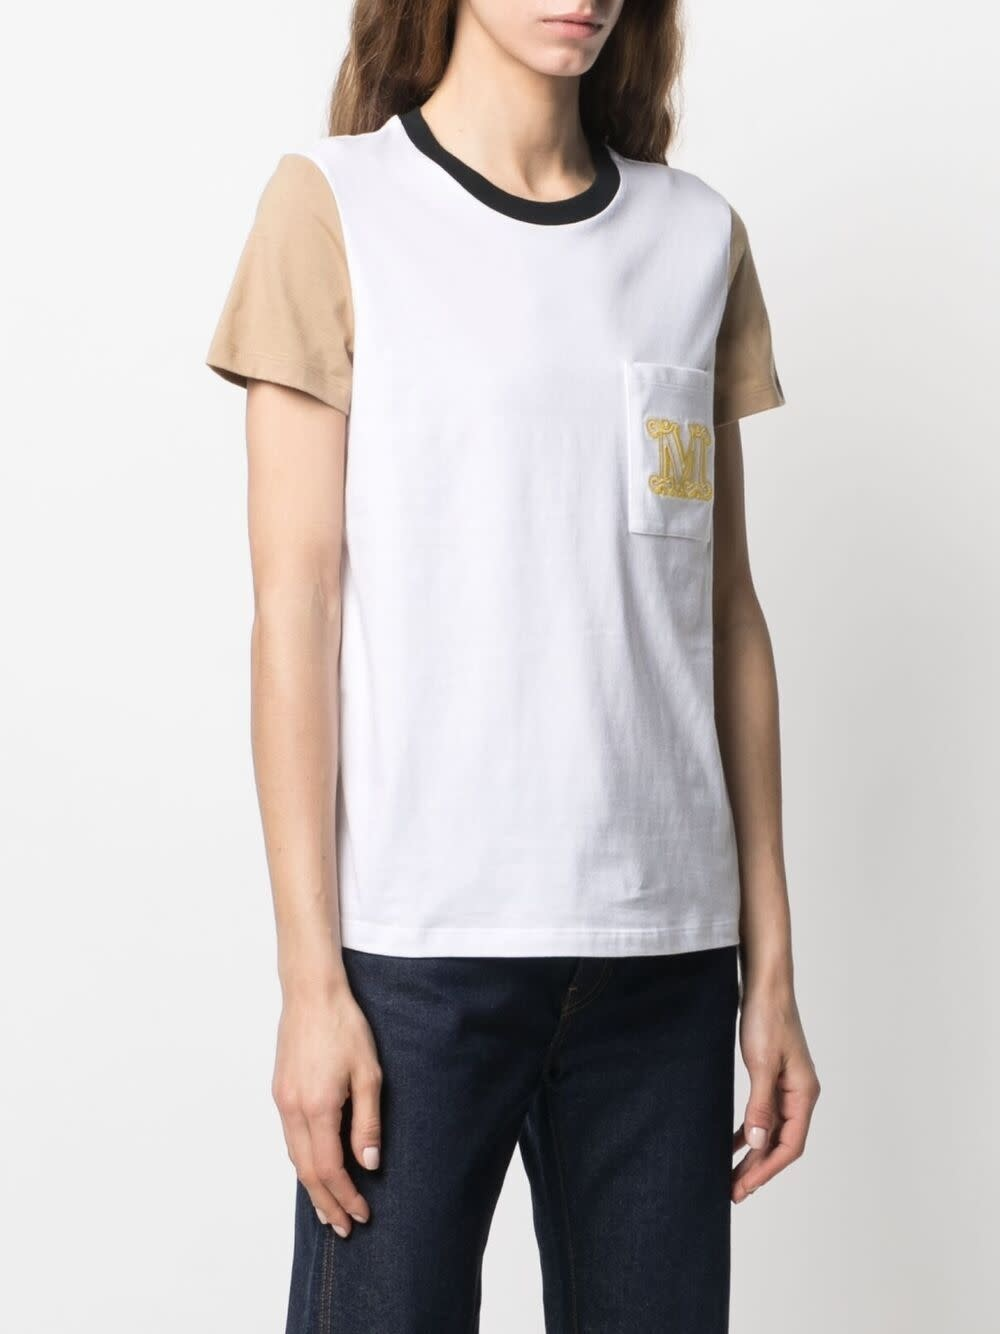 Diego T-shirt MaxMara-2